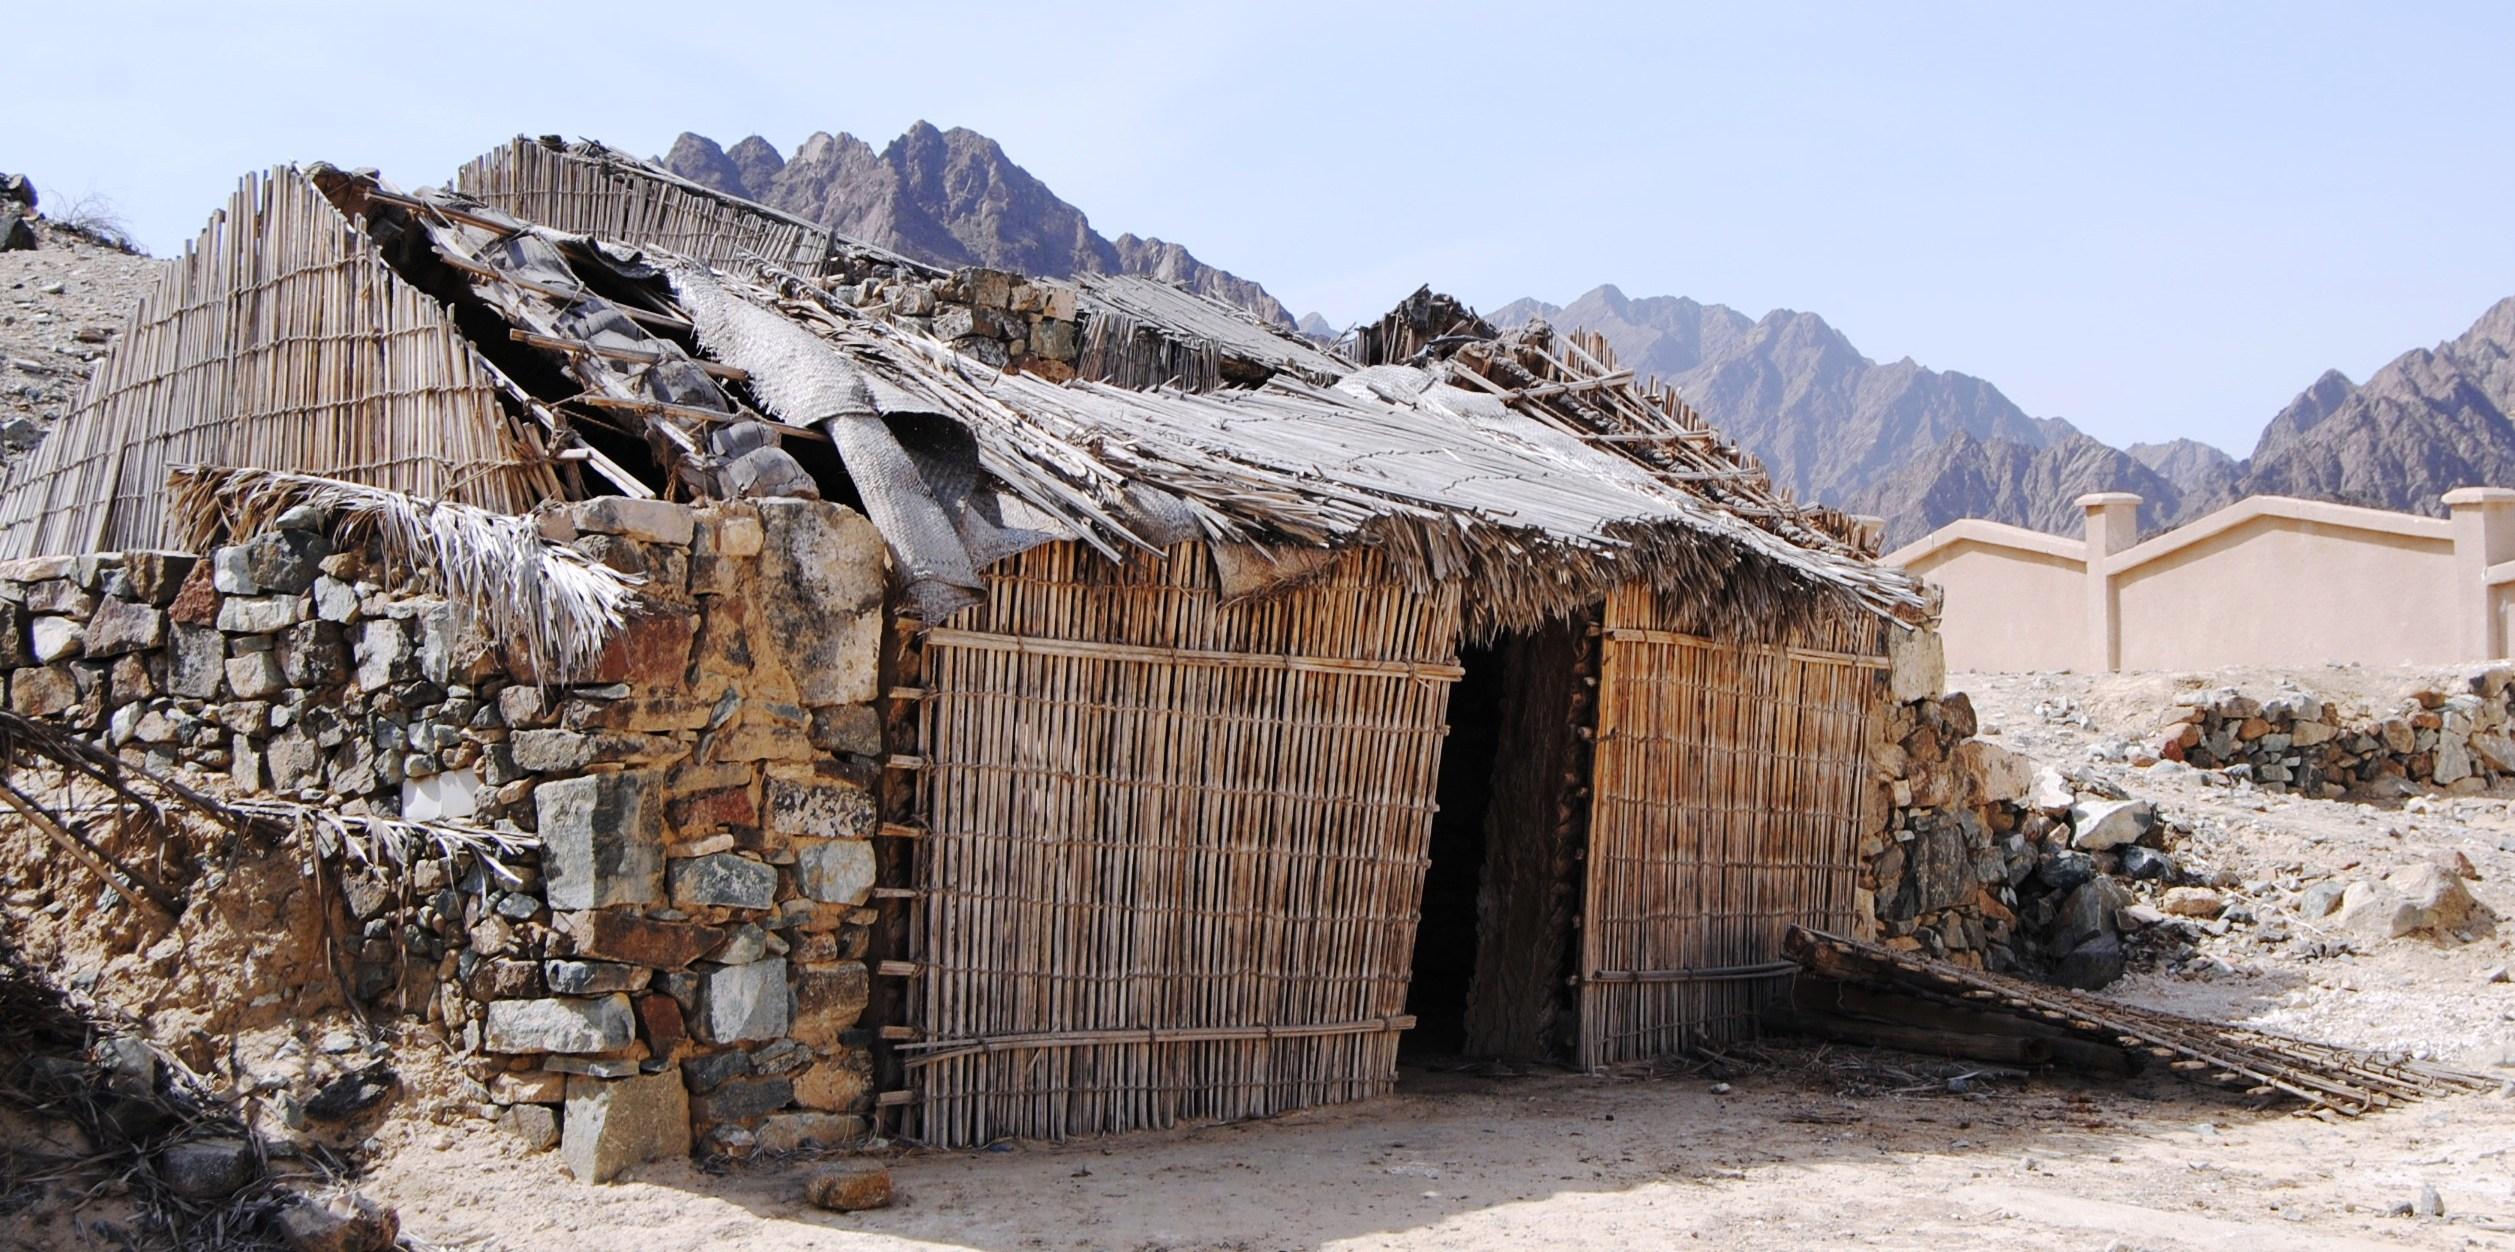 Imagenes de diferentes tipos de viviendas imagui - Fotos de viviendas ...